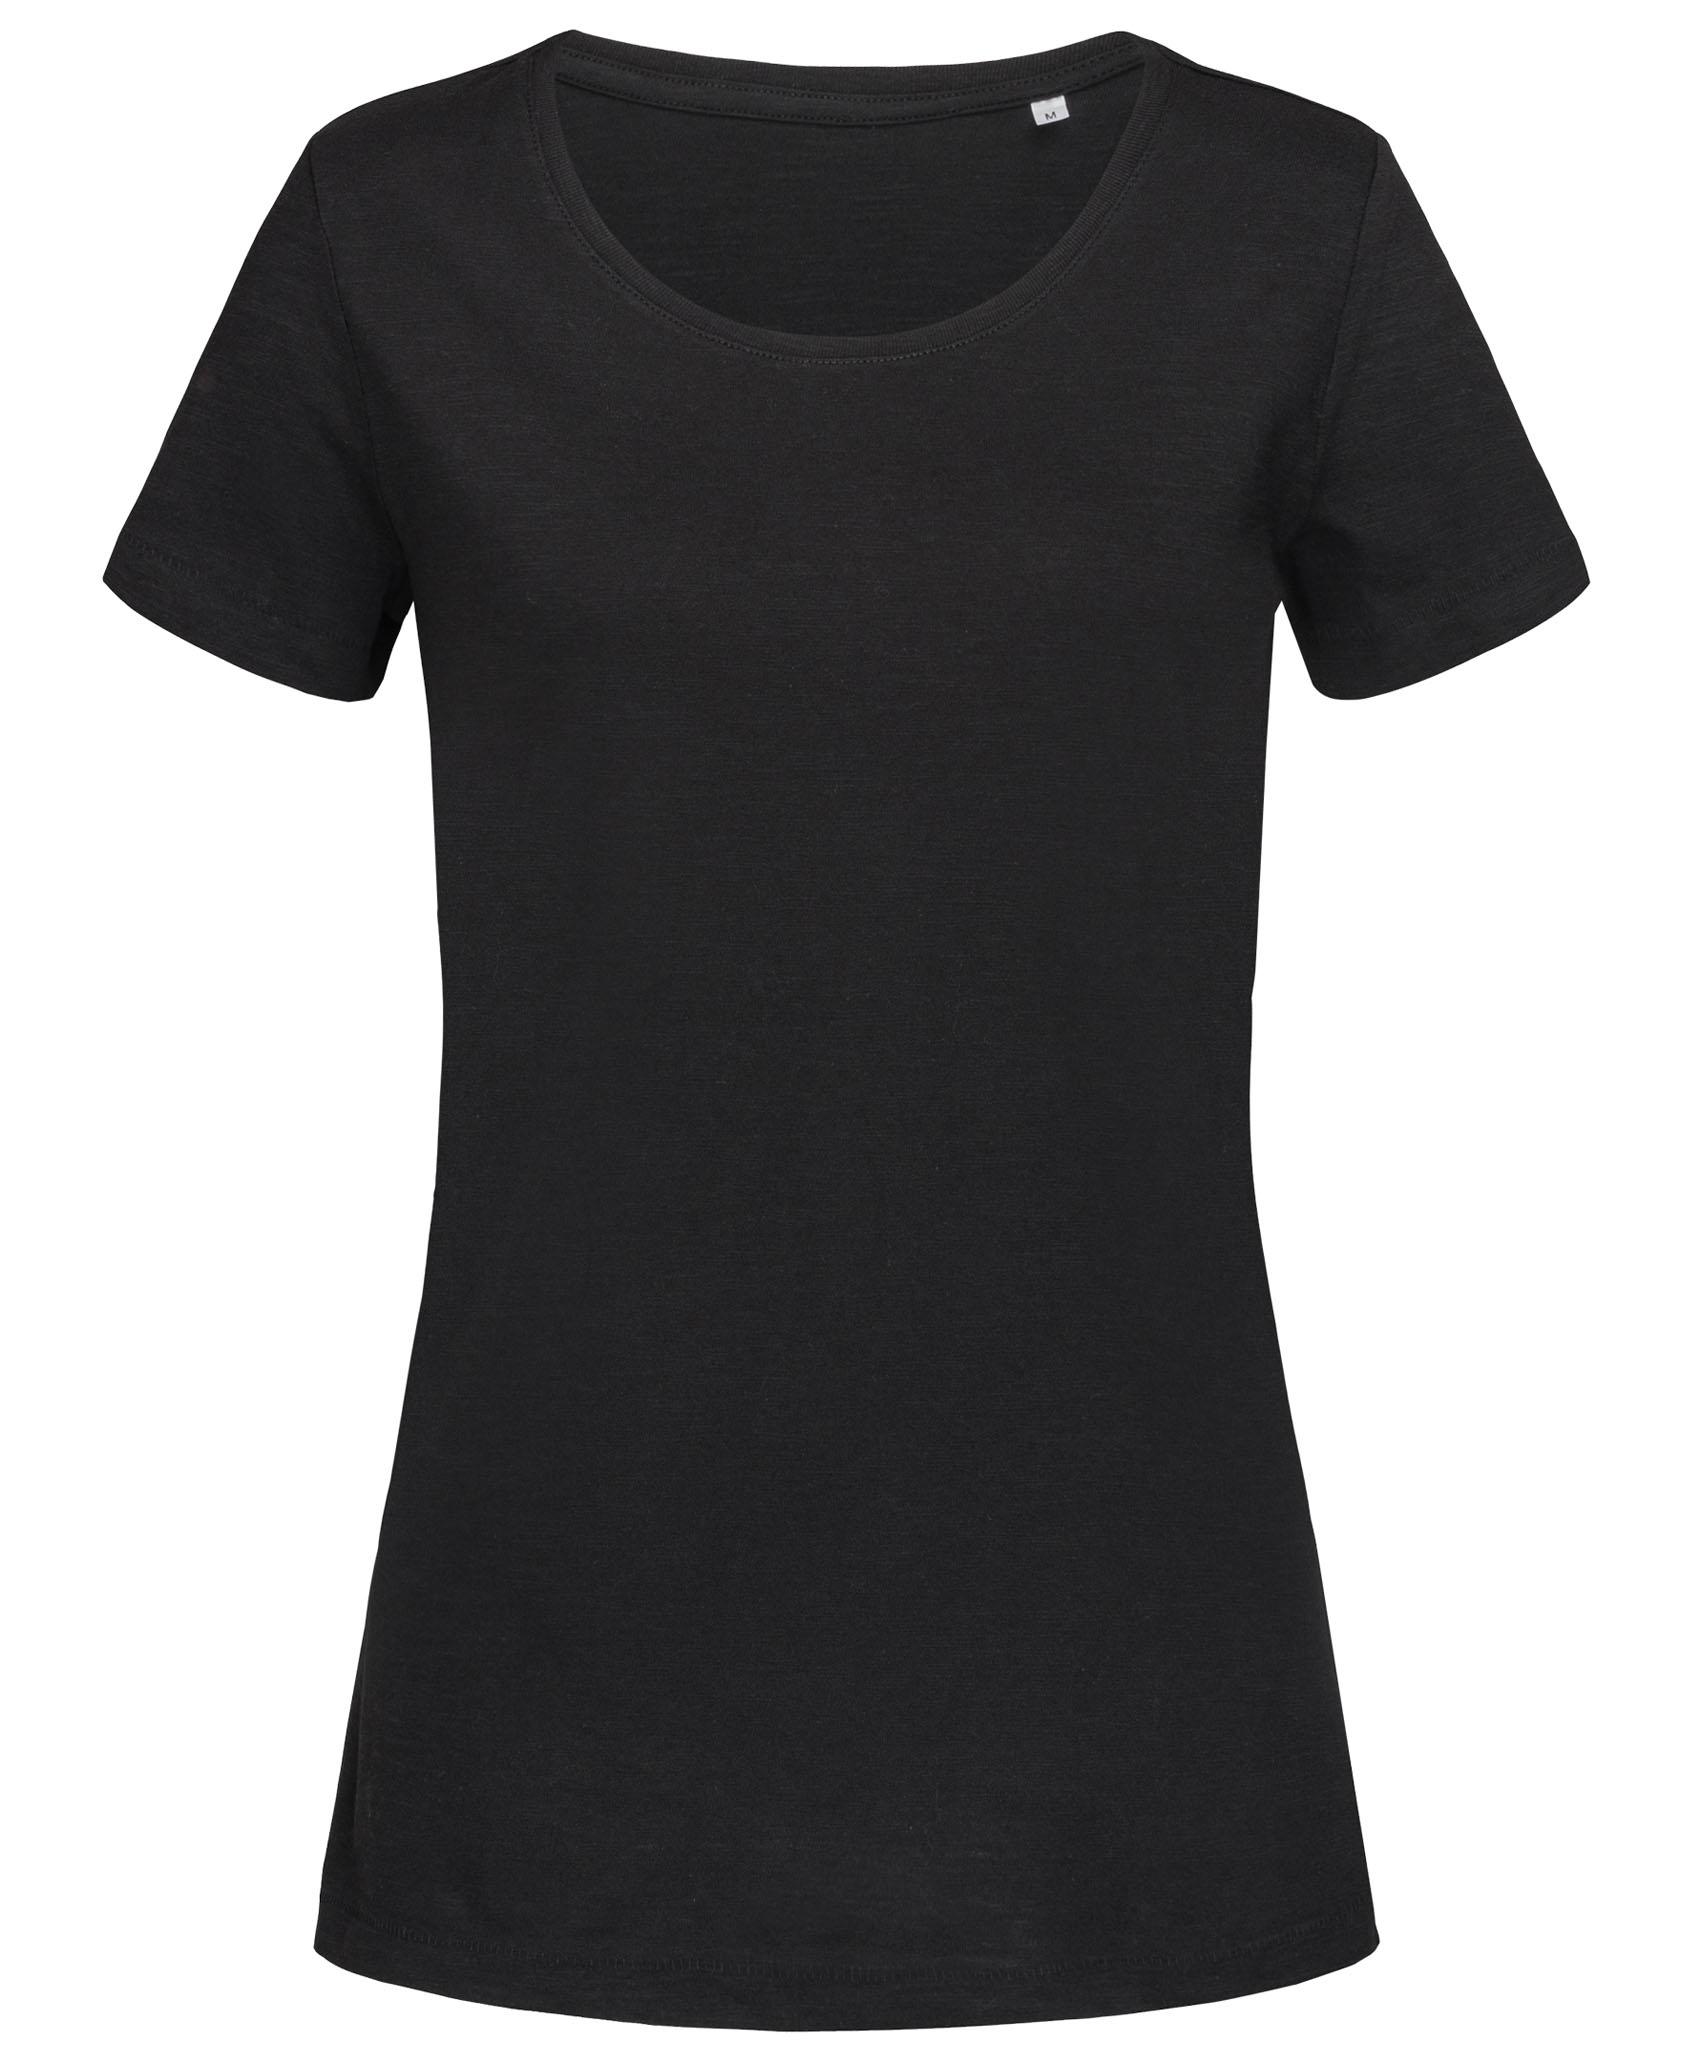 Stedman T-shirt Crewneck Sharon for her